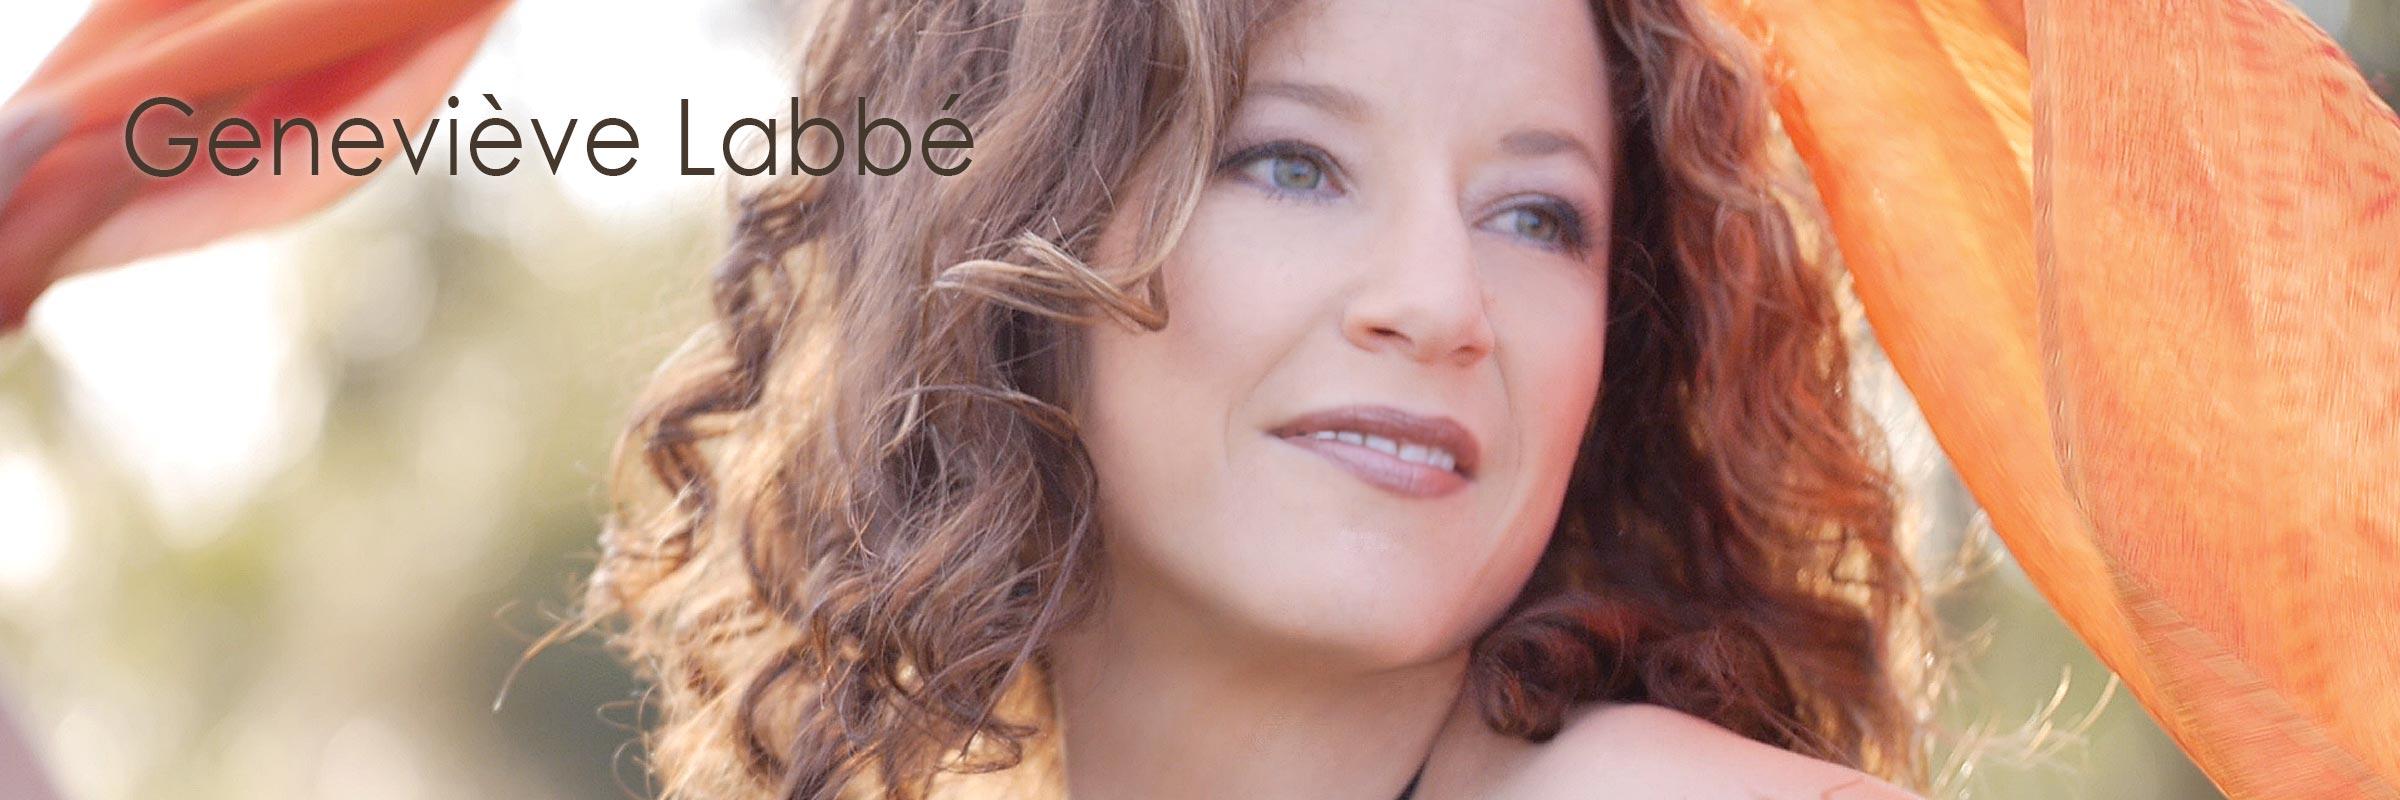 Geneviève Labbé